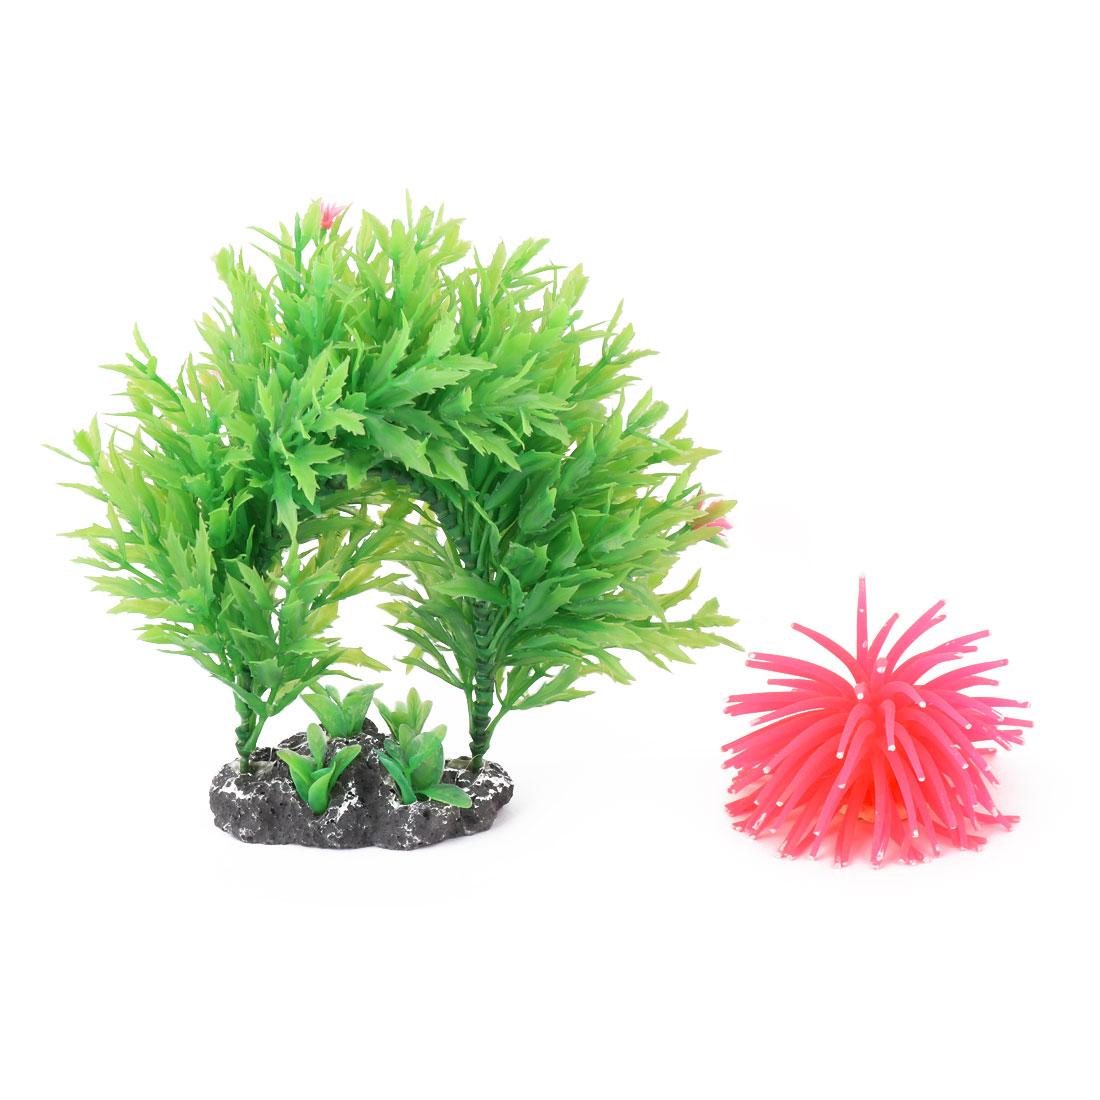 Aquarium Tank Plastic Artificial Mini Coral Wreath Water Plants Grass 2 in 1